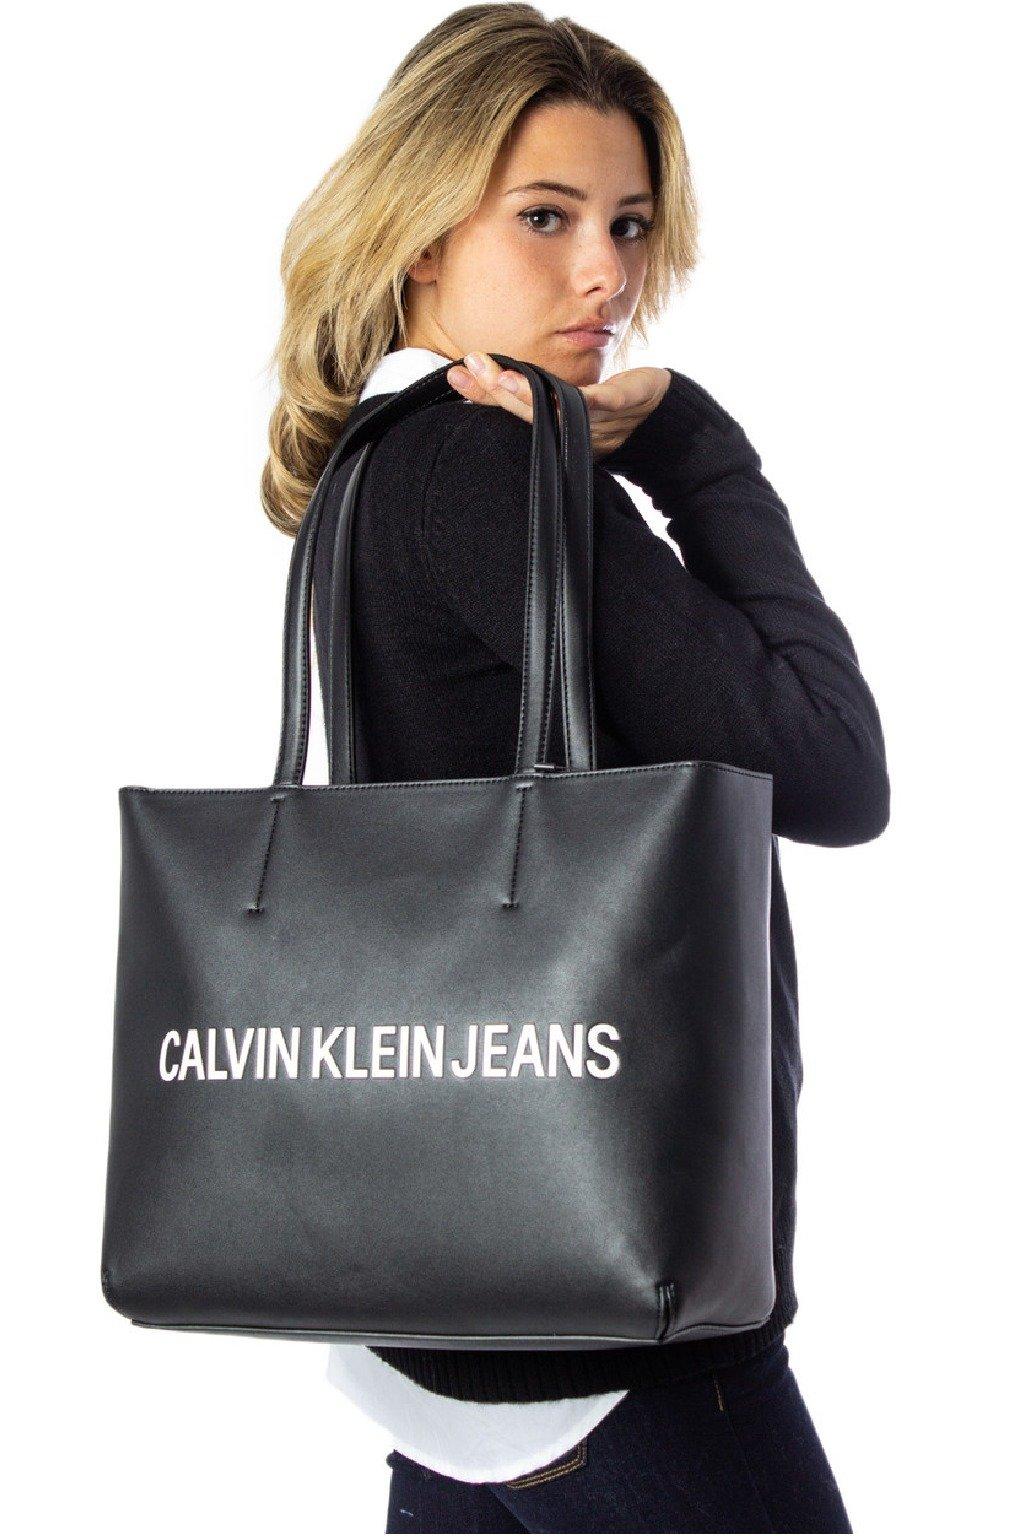 Kabelka Calvin Klein Cerna A4 tote shoper shopperka CKJ pres rameno znackova kabelka CK (5)